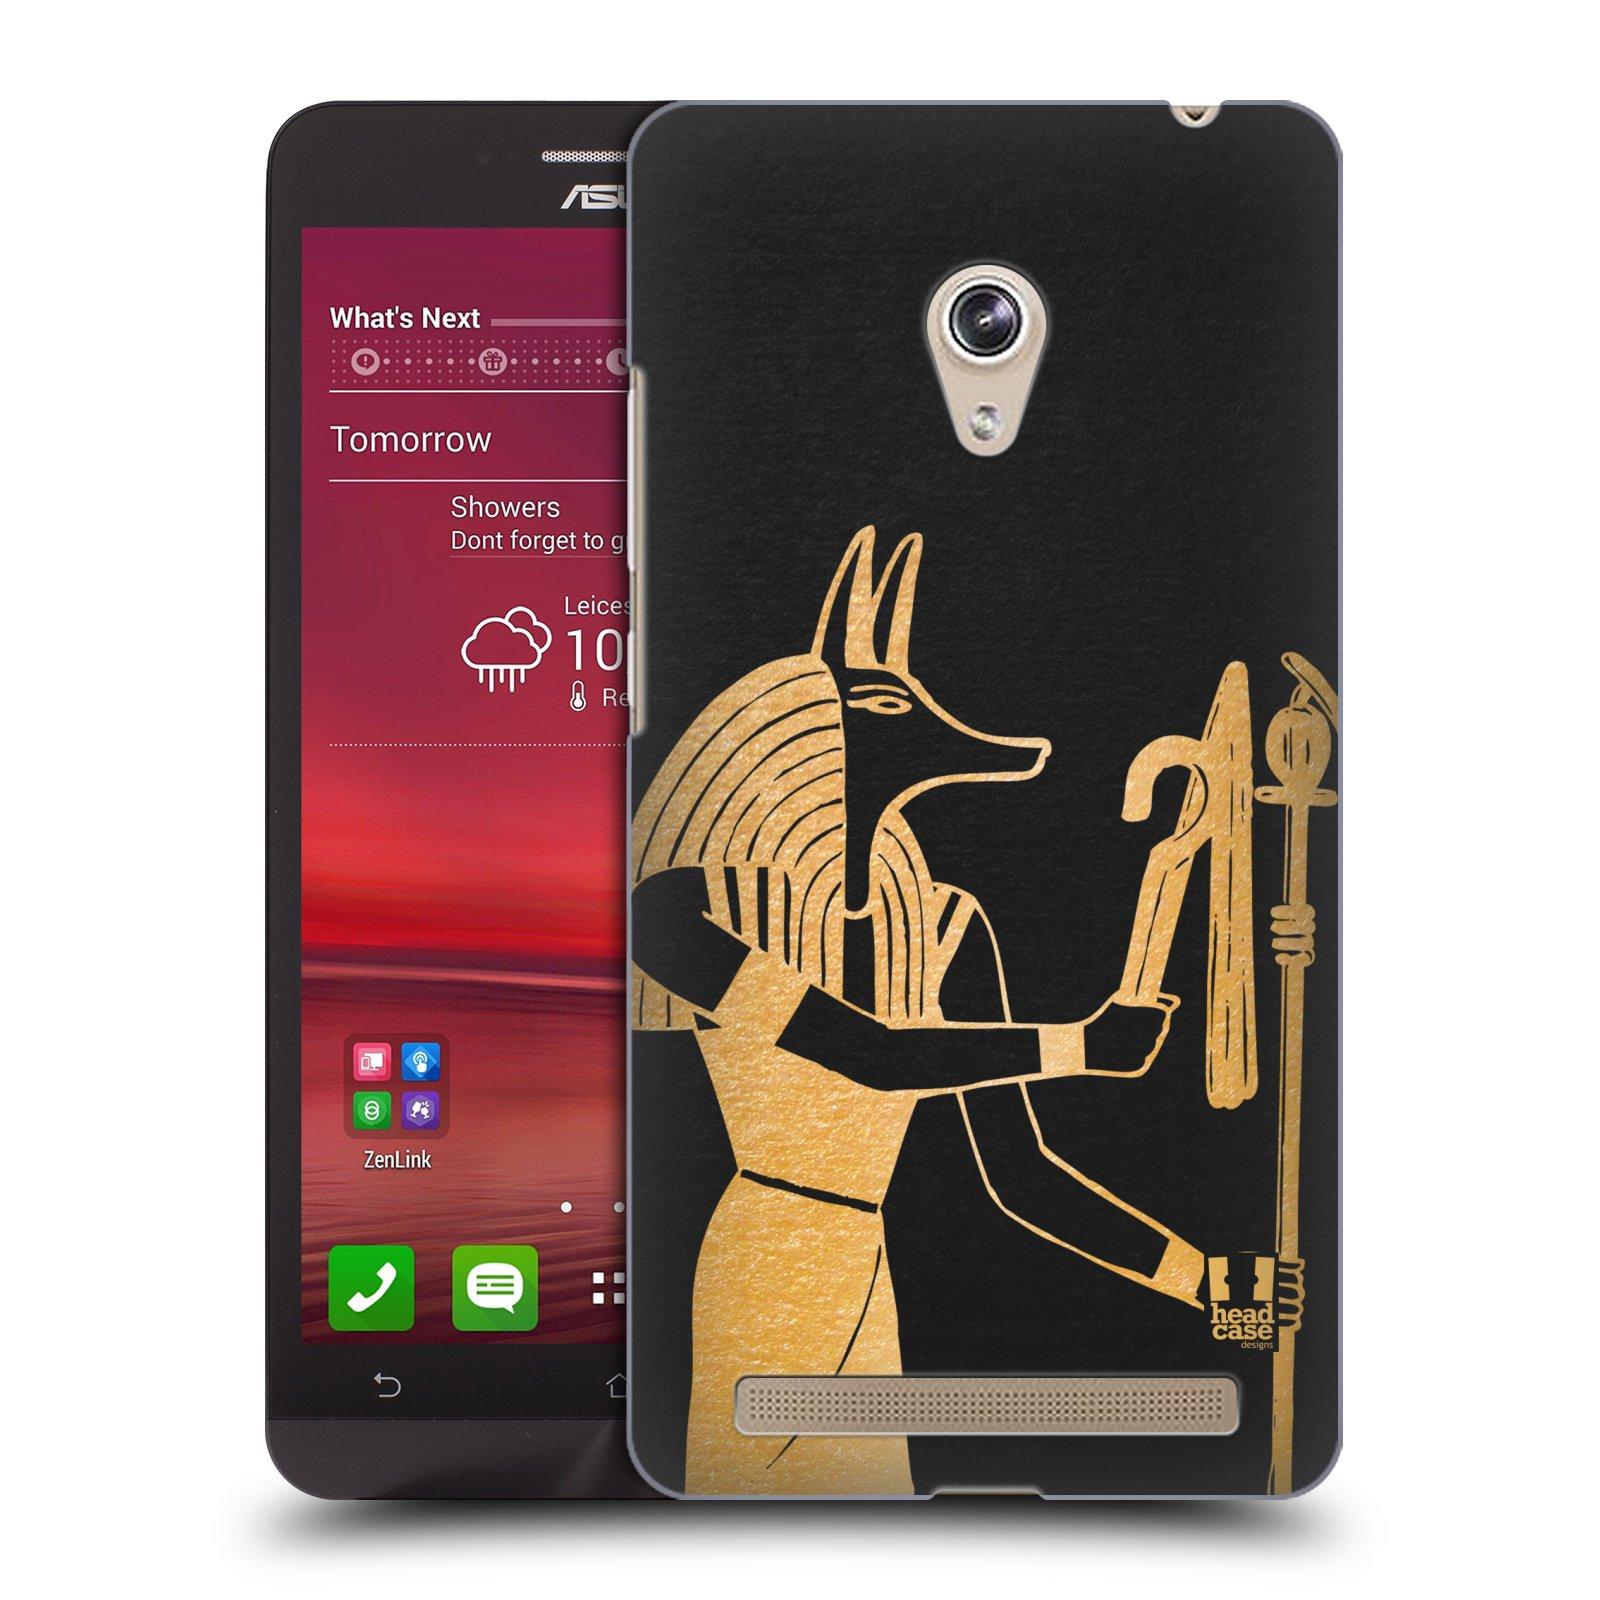 Plastové pouzdro na mobil Asus Zenfone 6 HEAD CASE EGYPT ANUBIS (Kryt či obal na mobilní telefon Asus Zenfone 6 A600CG / A601CG)